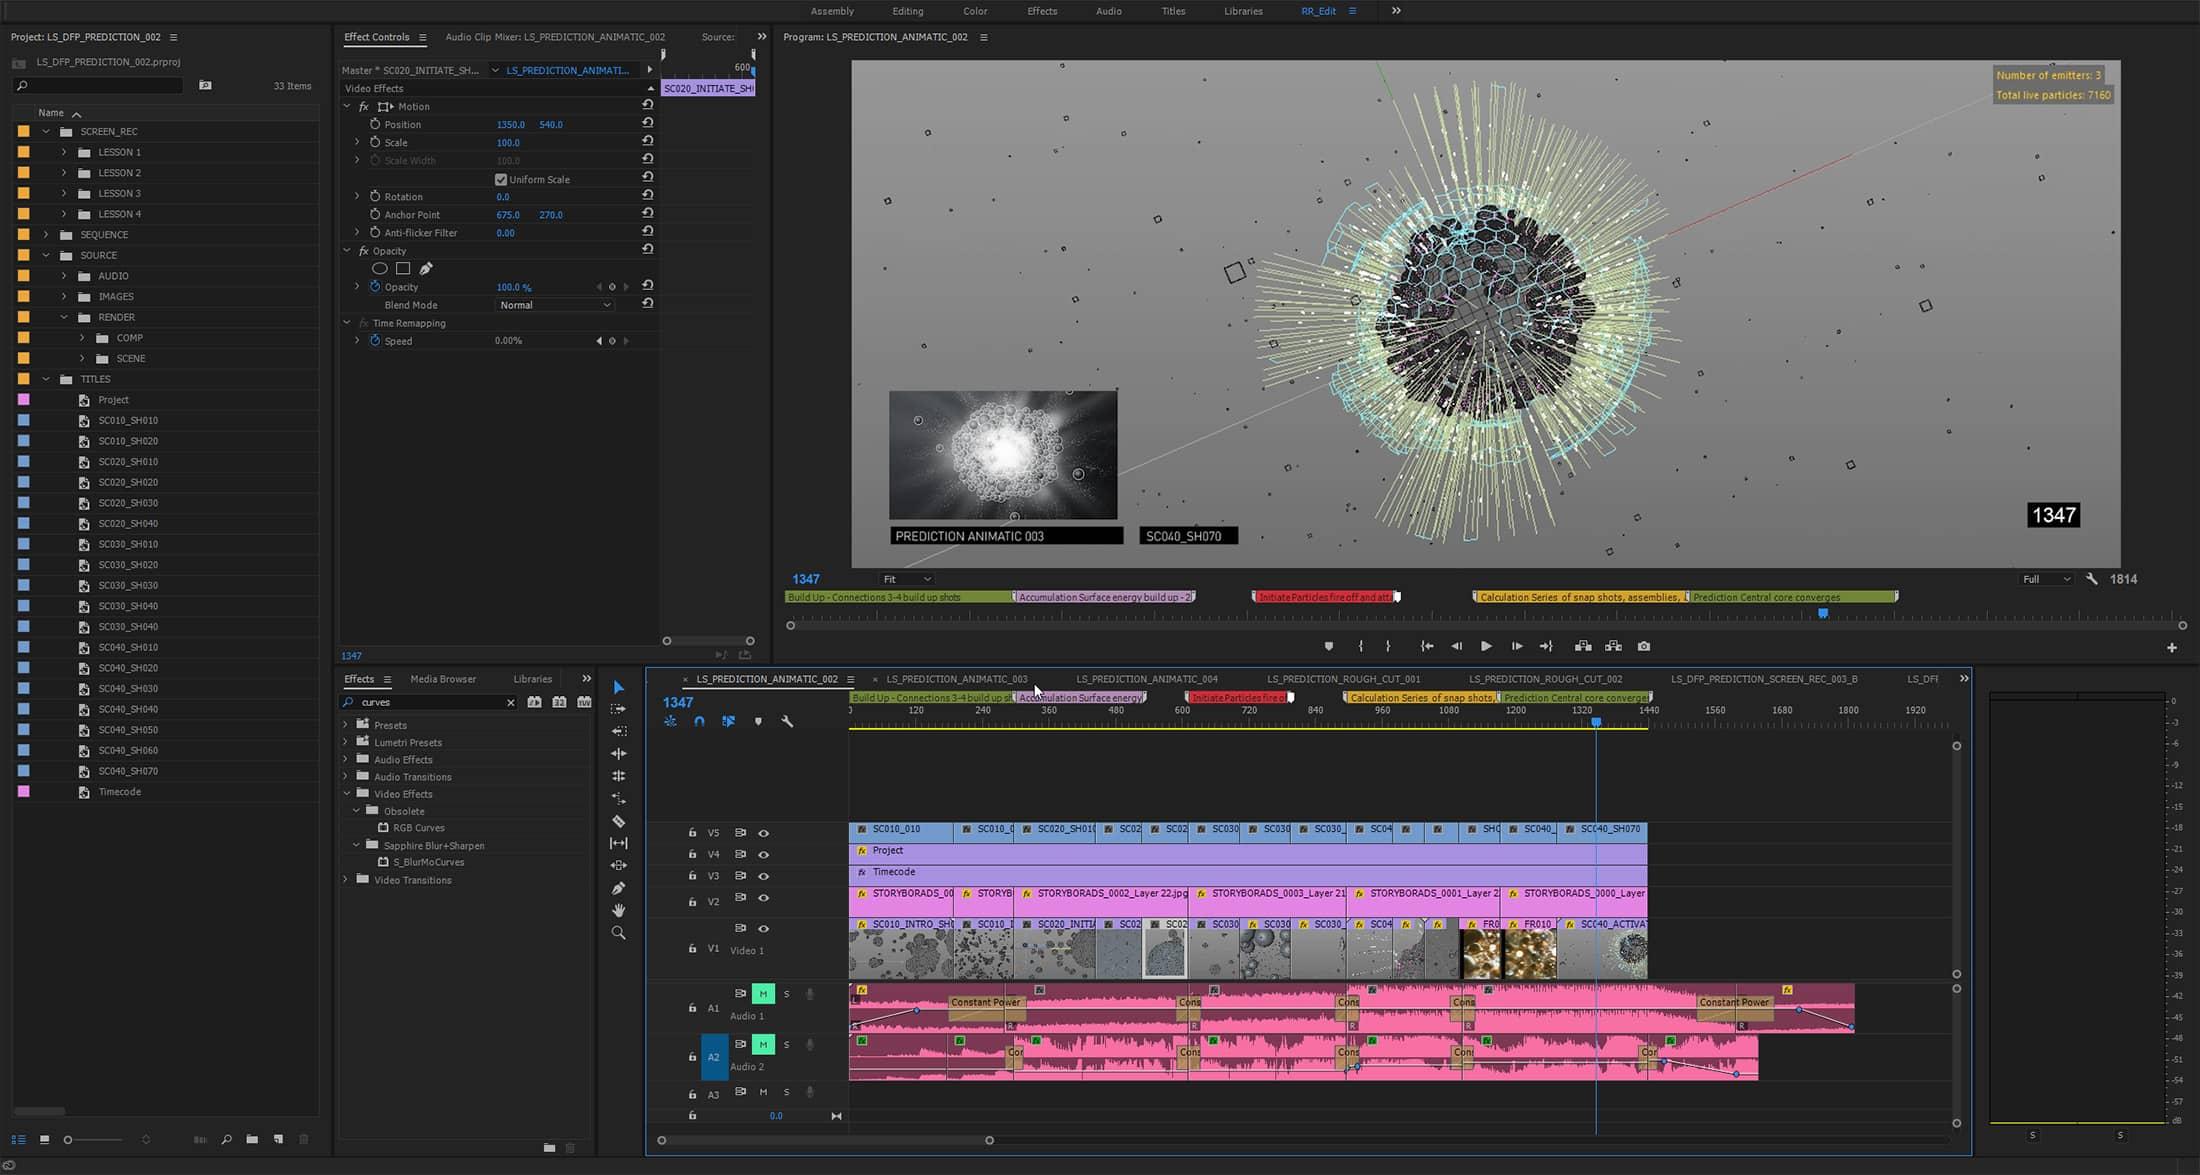 WEEK_02__0005_Adobe-Premiere-Pro_2017-05-08_10-10-46.png-min